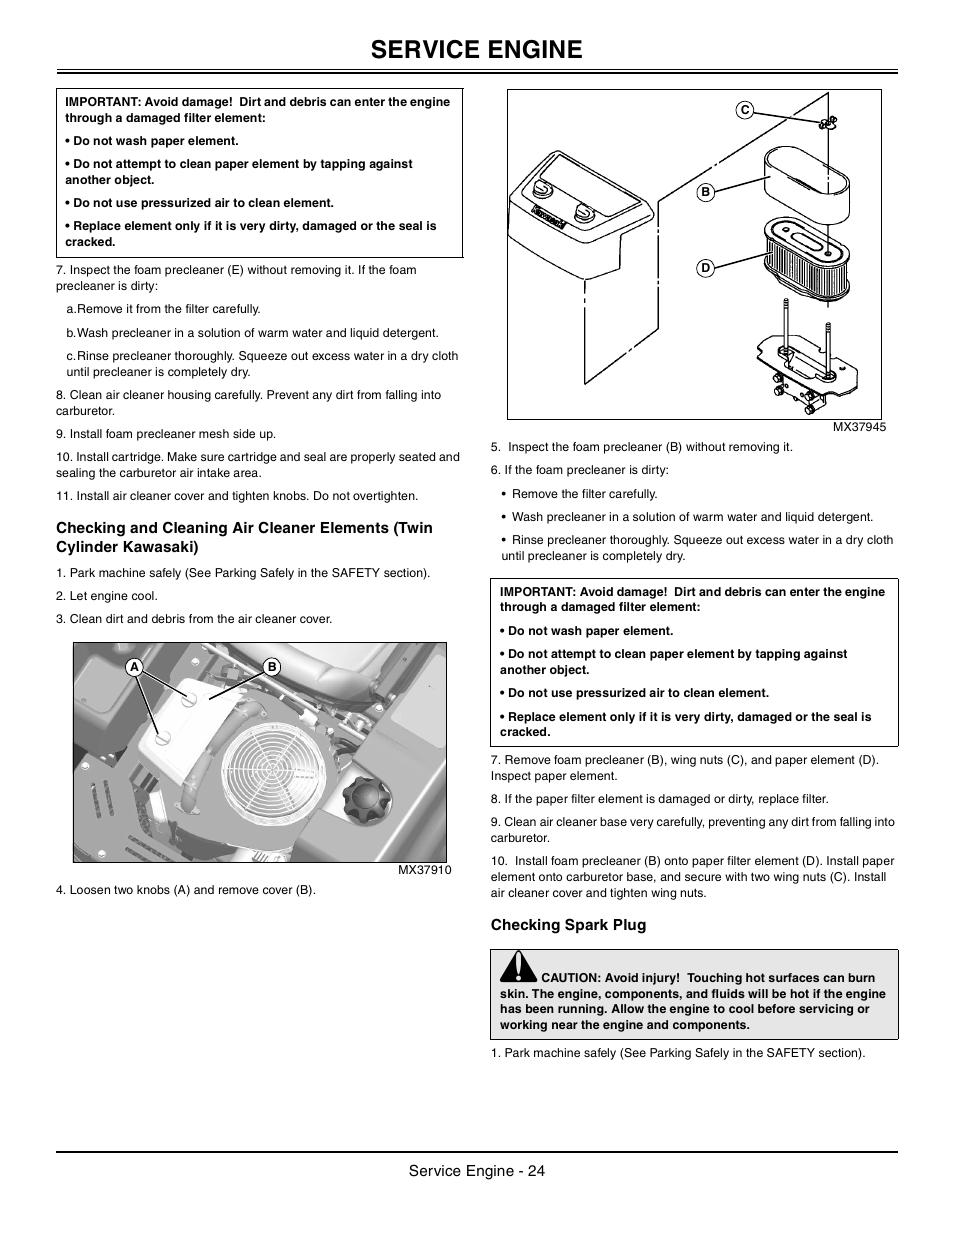 checking spark plug  service engine